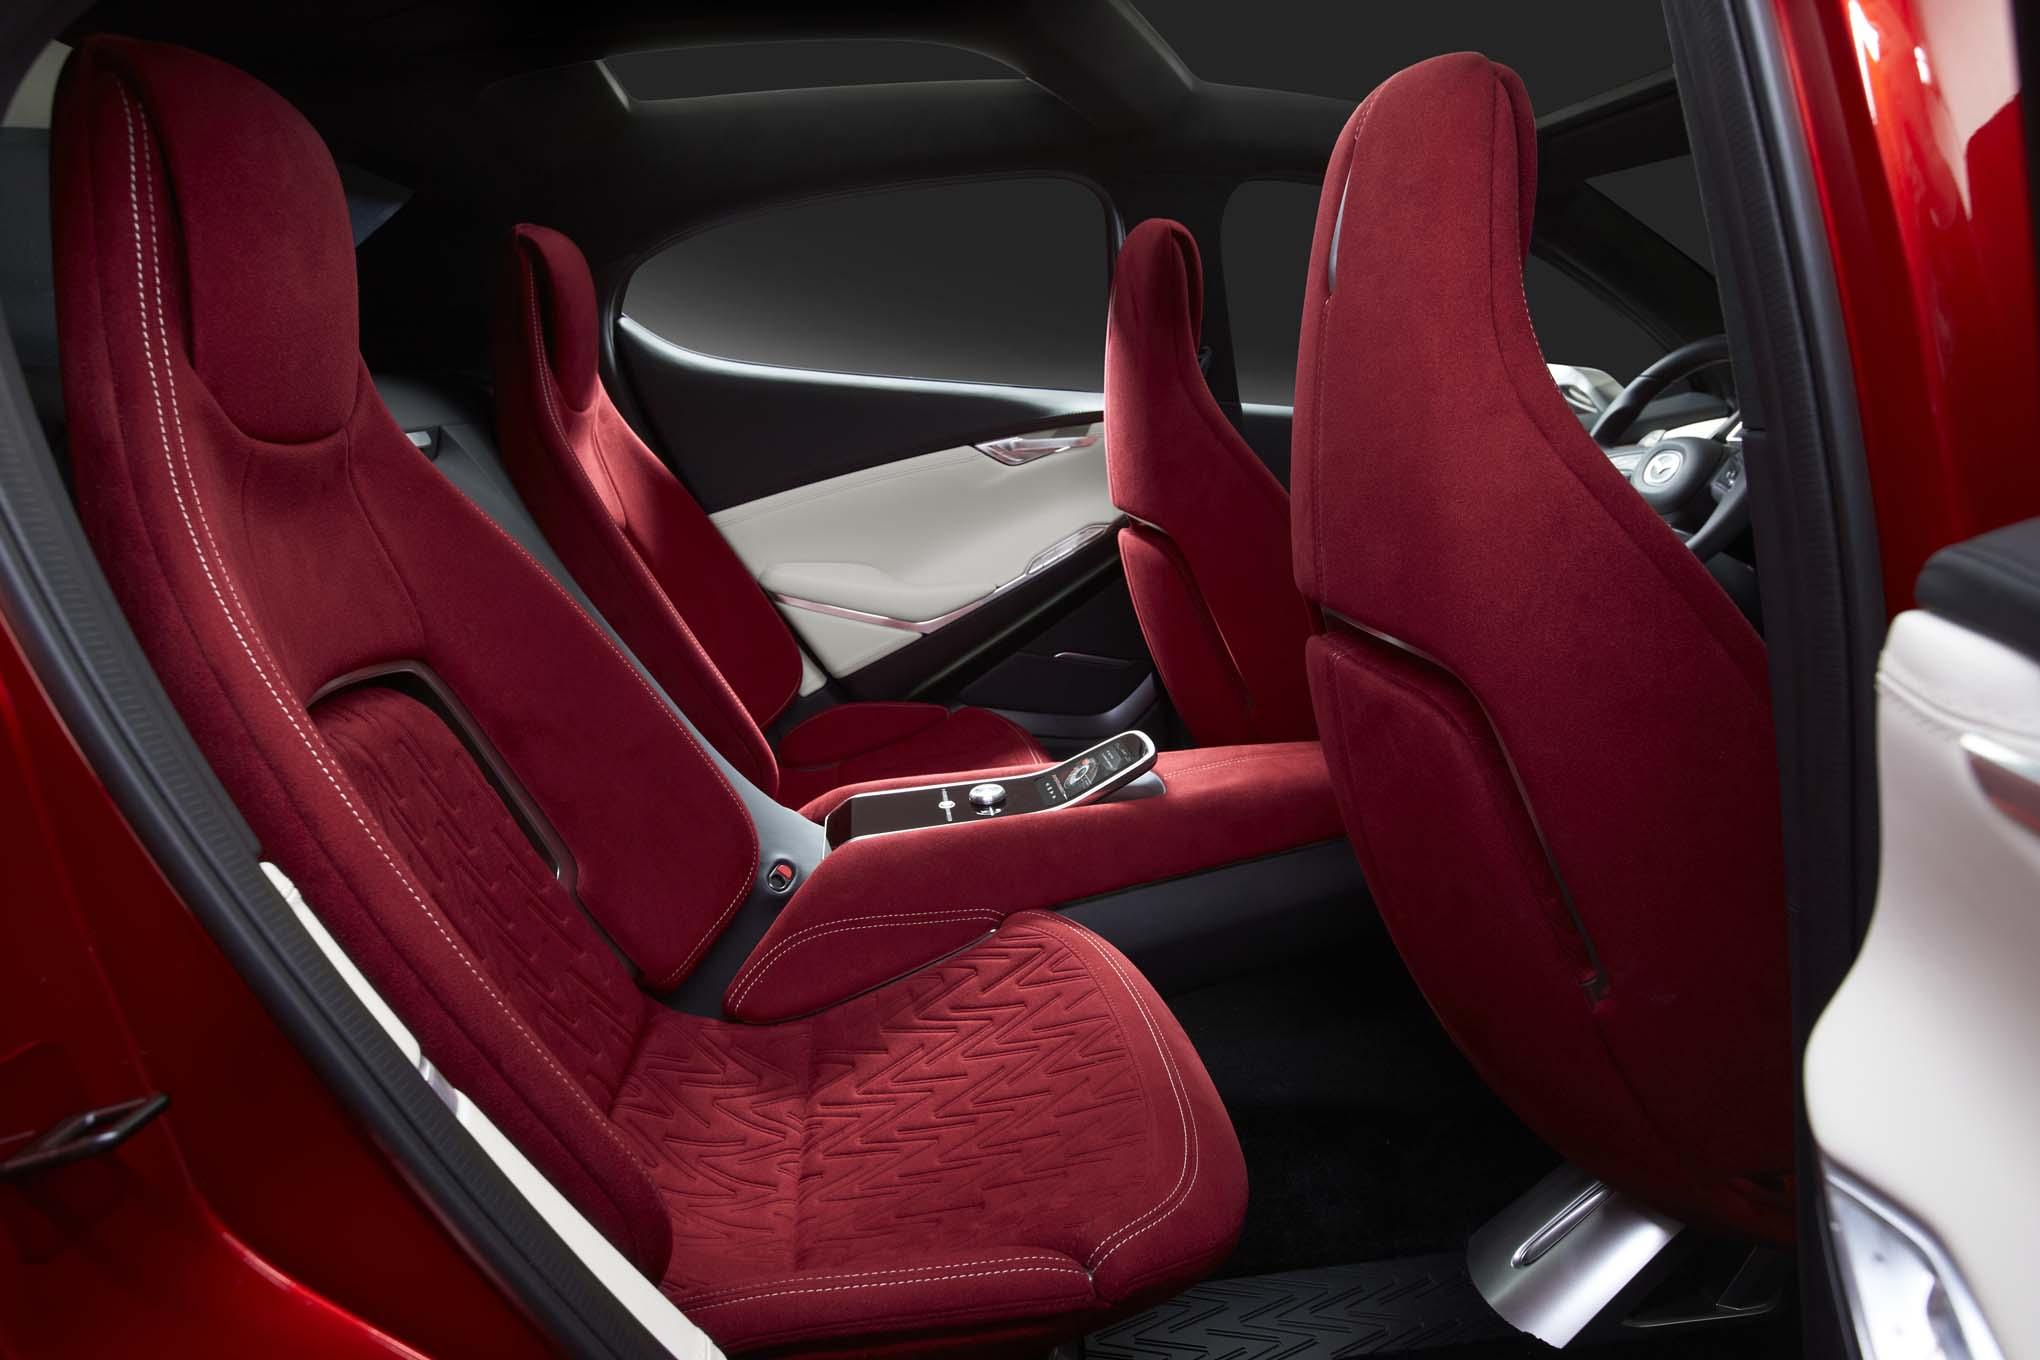 http://st.automobilemag.com/uploads/sites/11/2014/03/Mazda-Hazumi-Concept-rear-interior.jpg